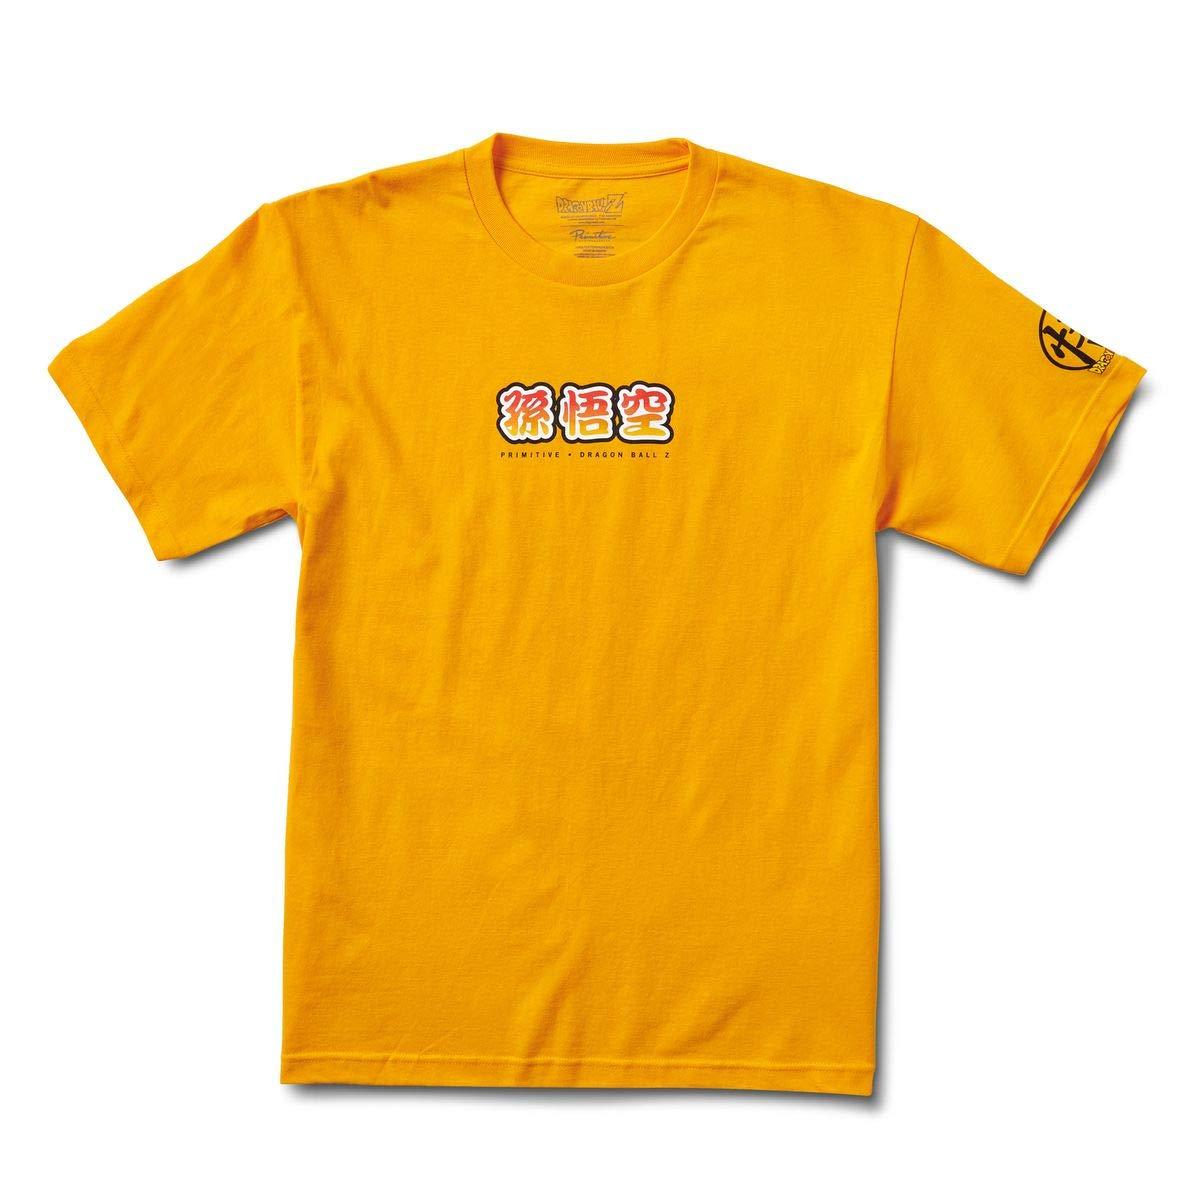 LG Gold Primitive x Dragonball Z Goku Saiyan Style T-Shirt